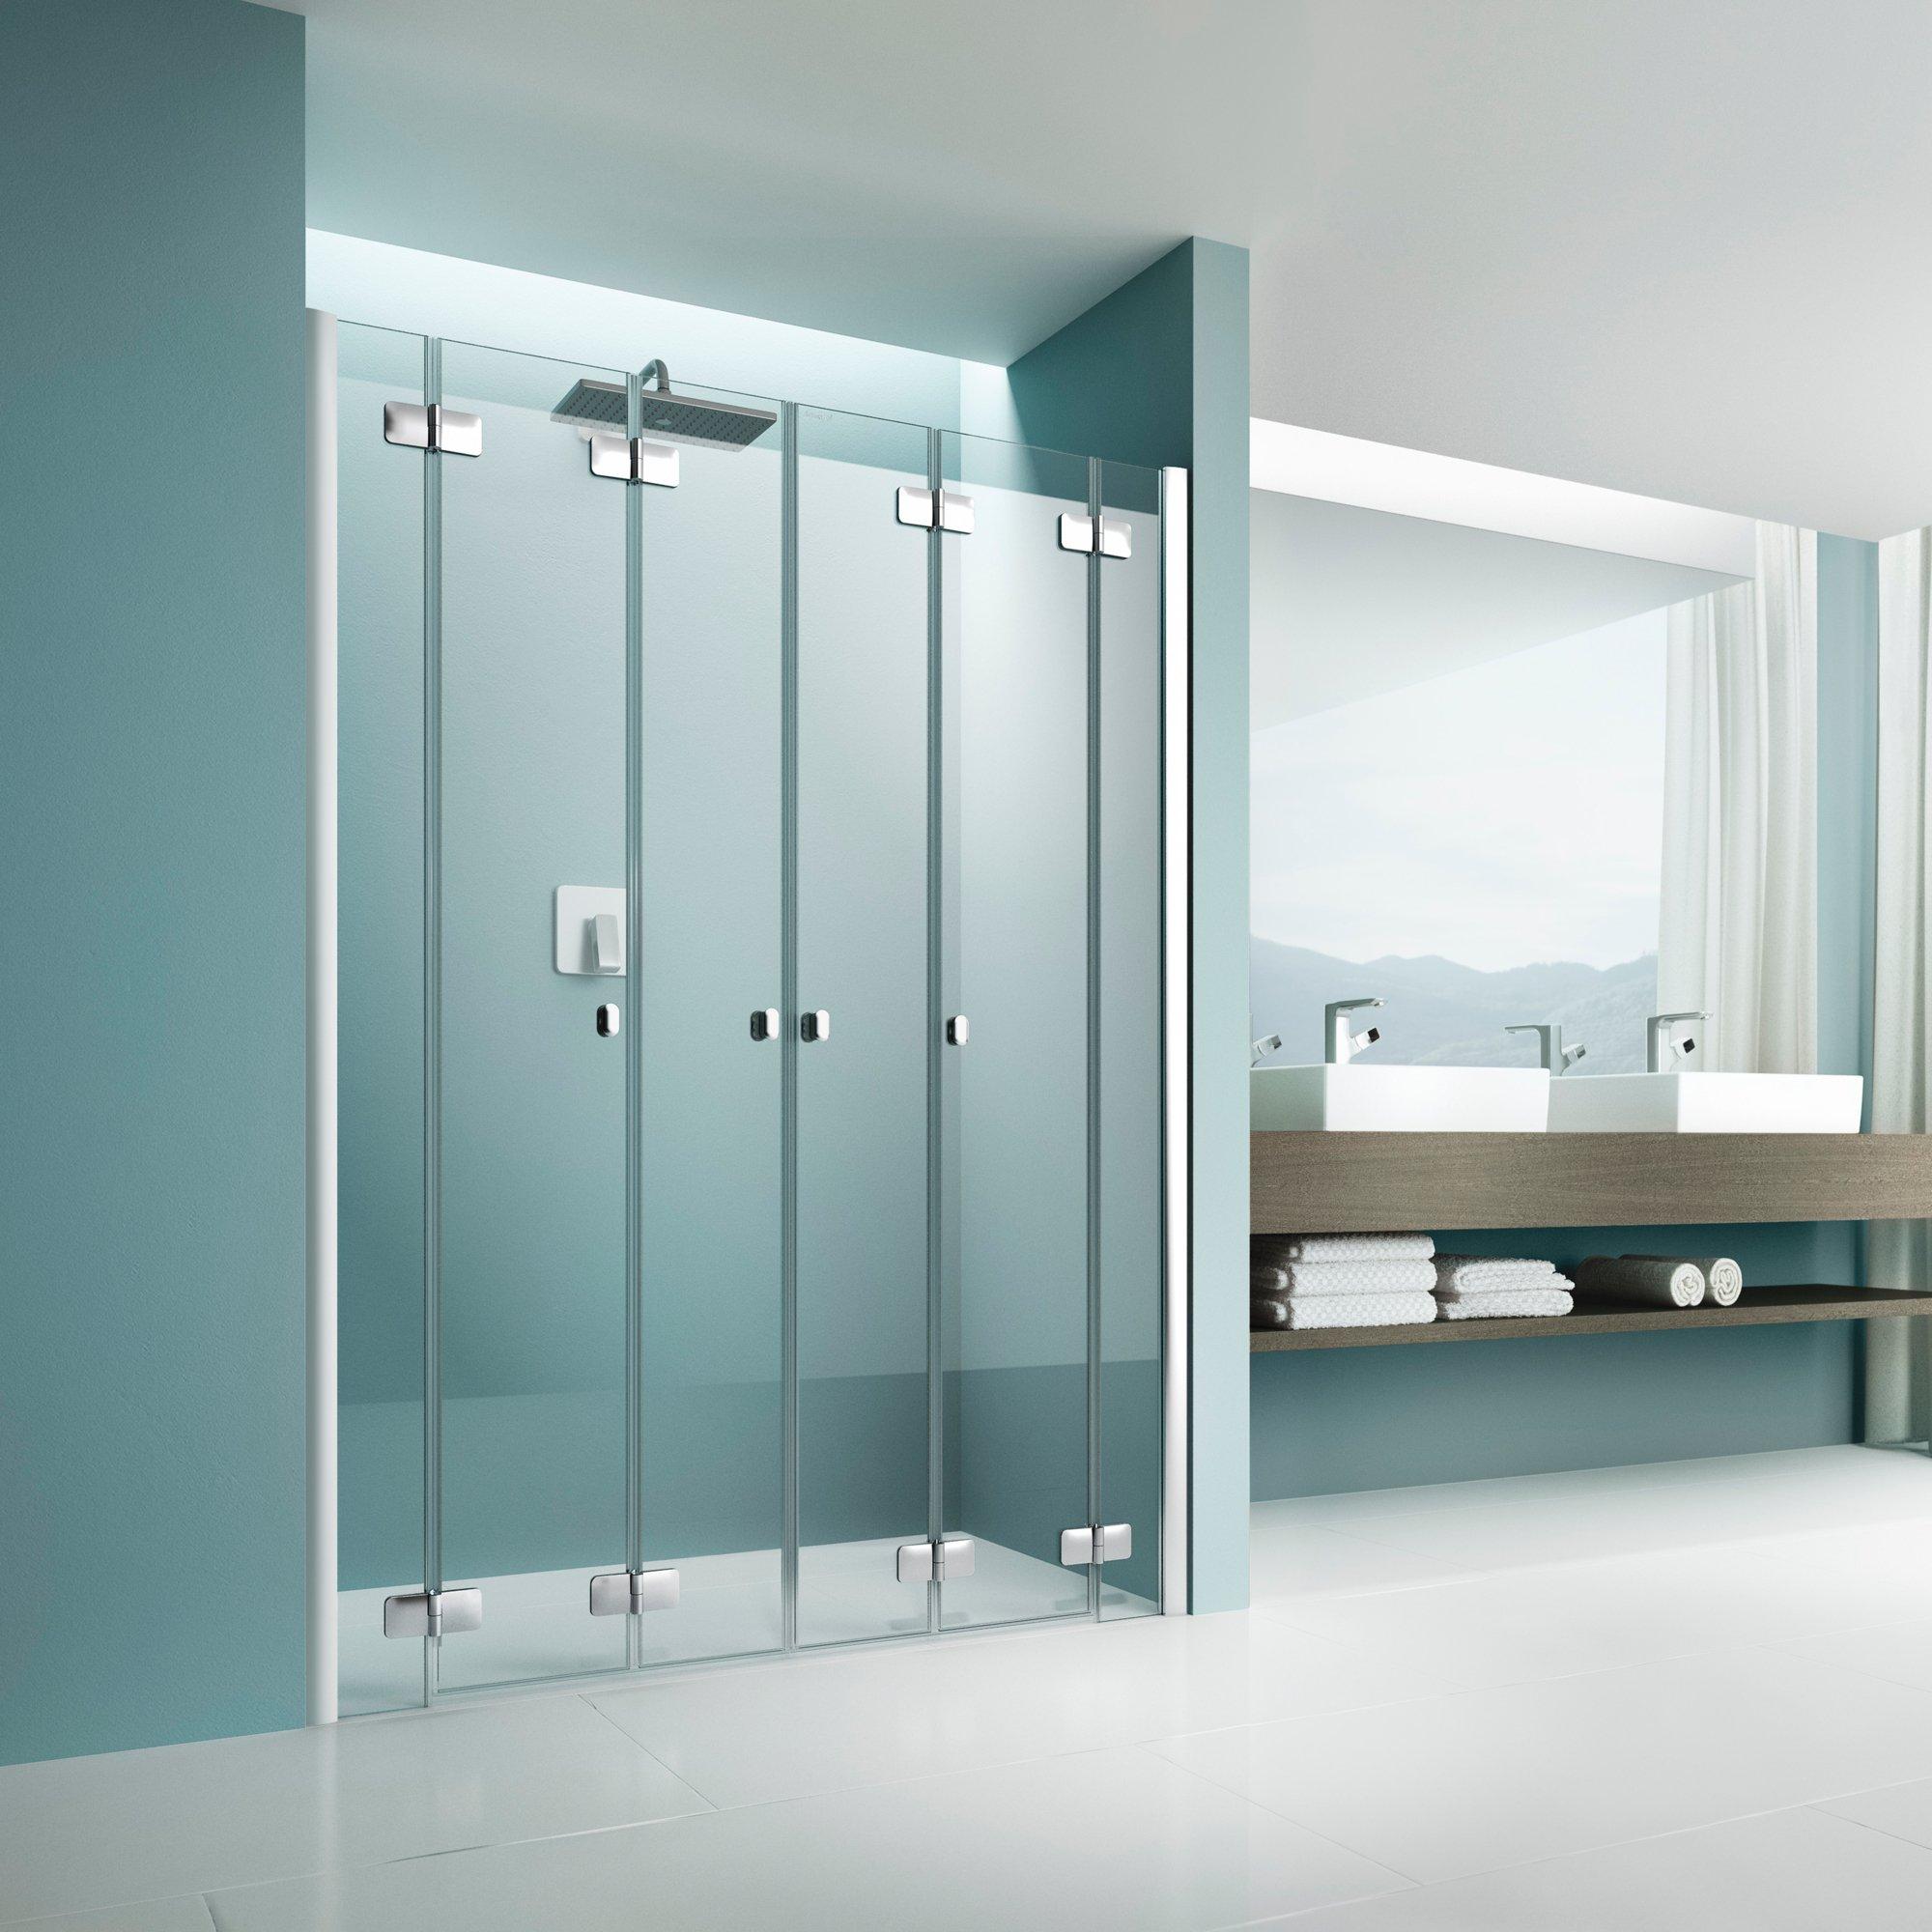 artweger dusch faltw nde f r mehr raum im bad. Black Bedroom Furniture Sets. Home Design Ideas